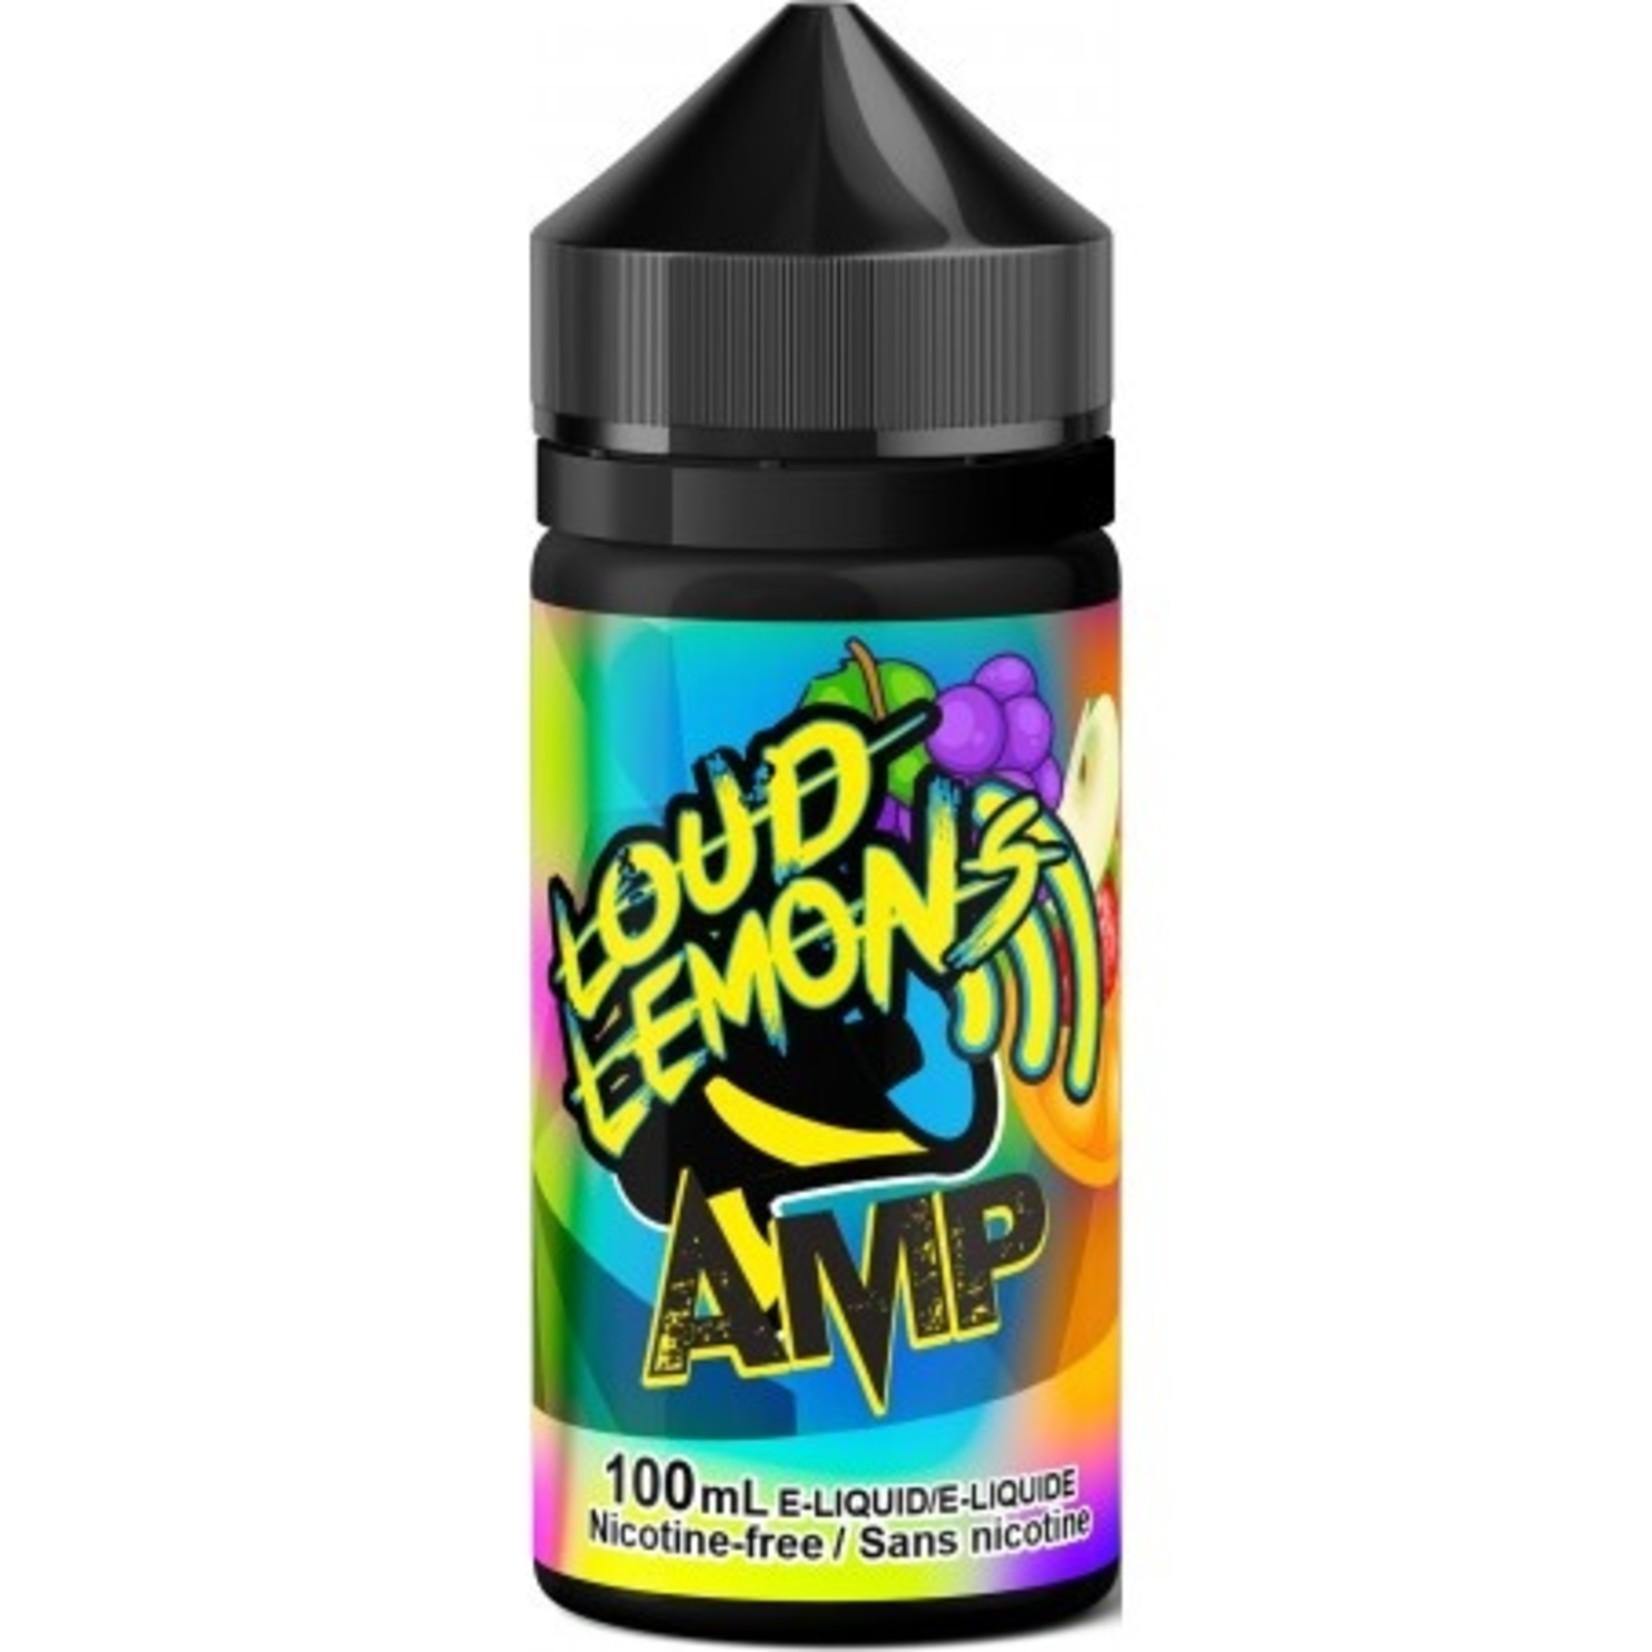 Loud Lemons Amp